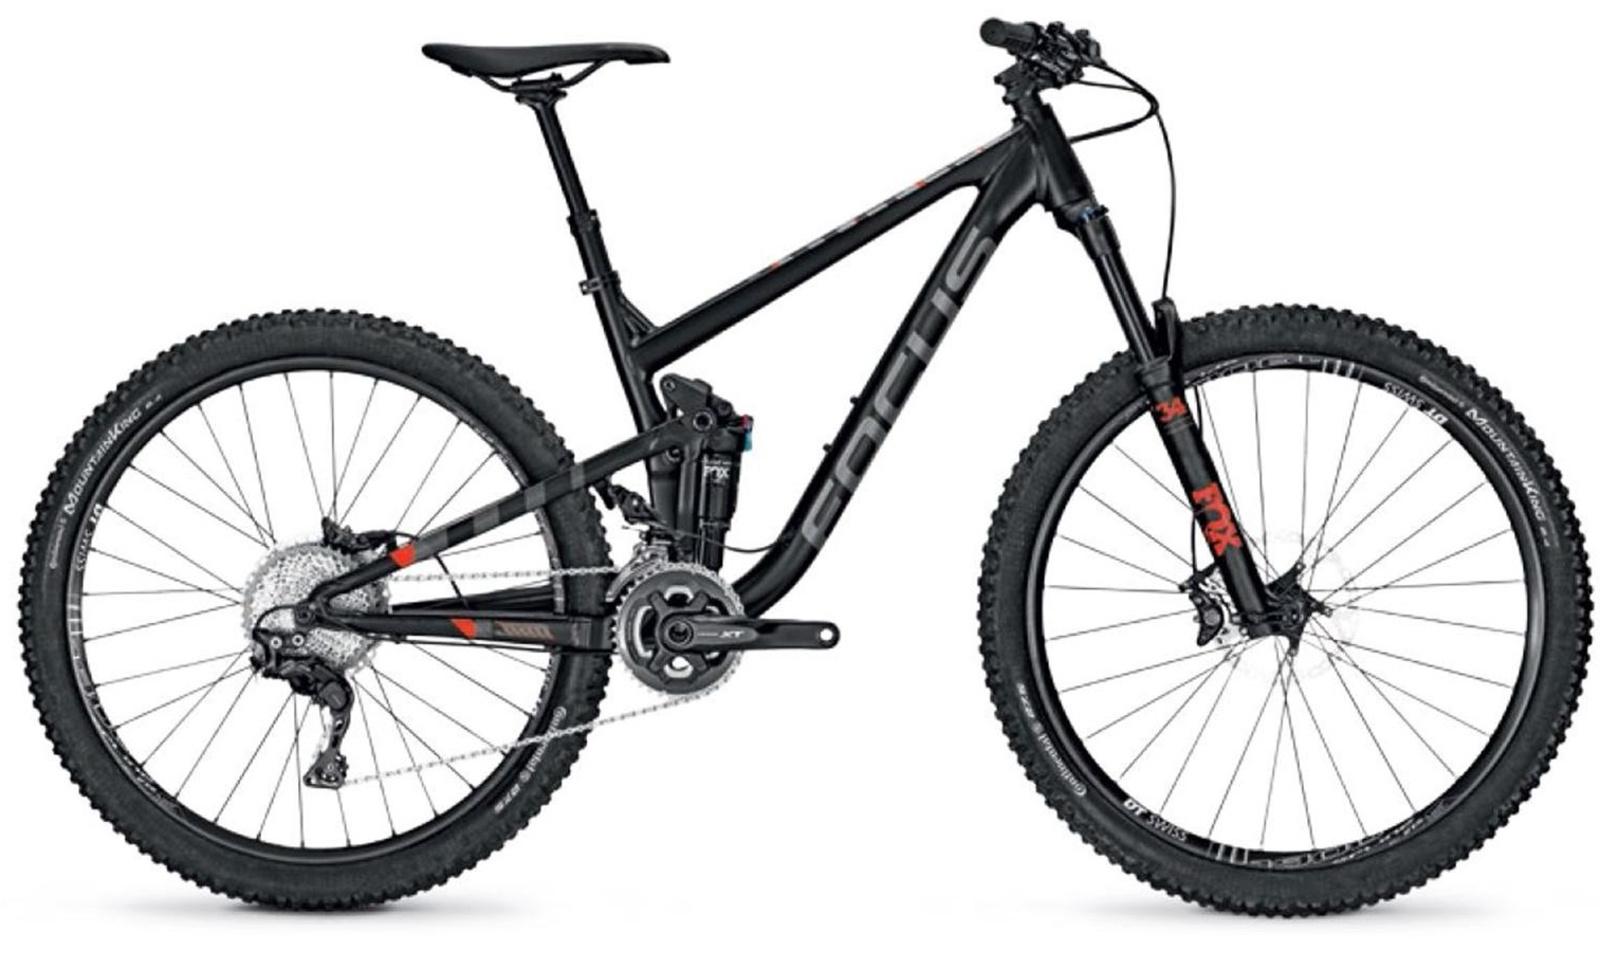 enduro allmountain mtb versandkostenfrei kaufen rabe bike. Black Bedroom Furniture Sets. Home Design Ideas